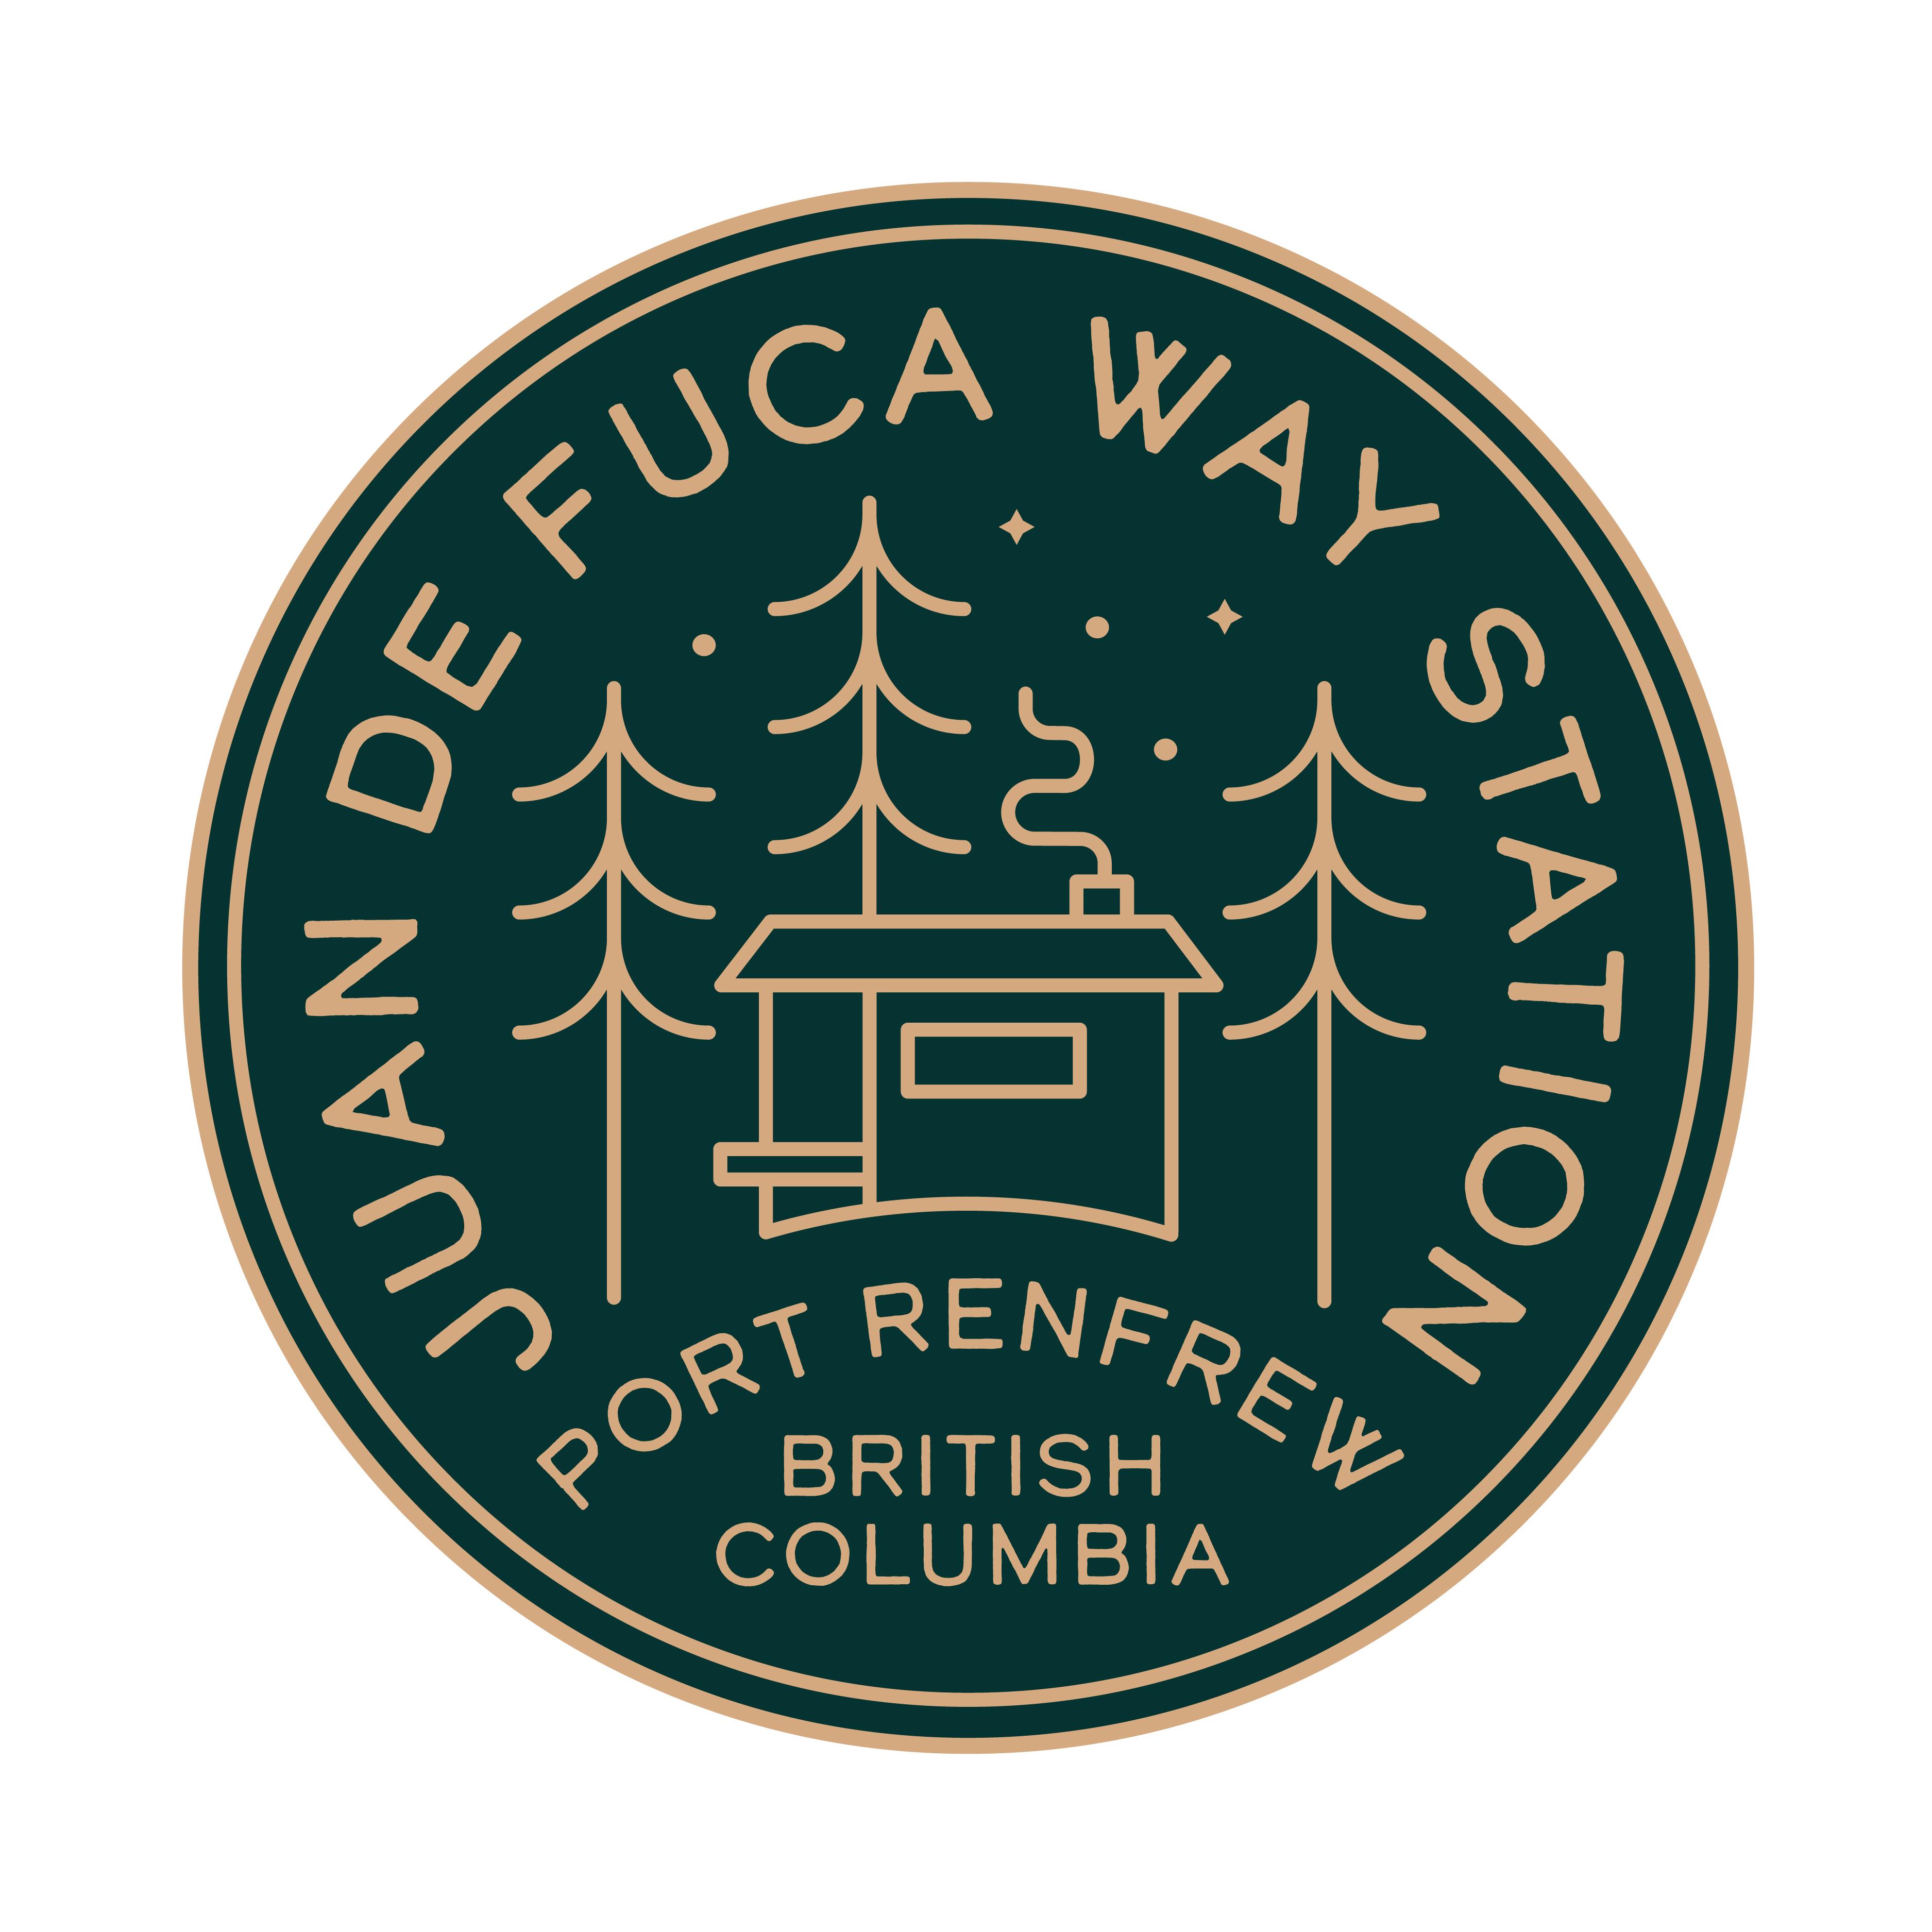 Juan de Fuca Way Station